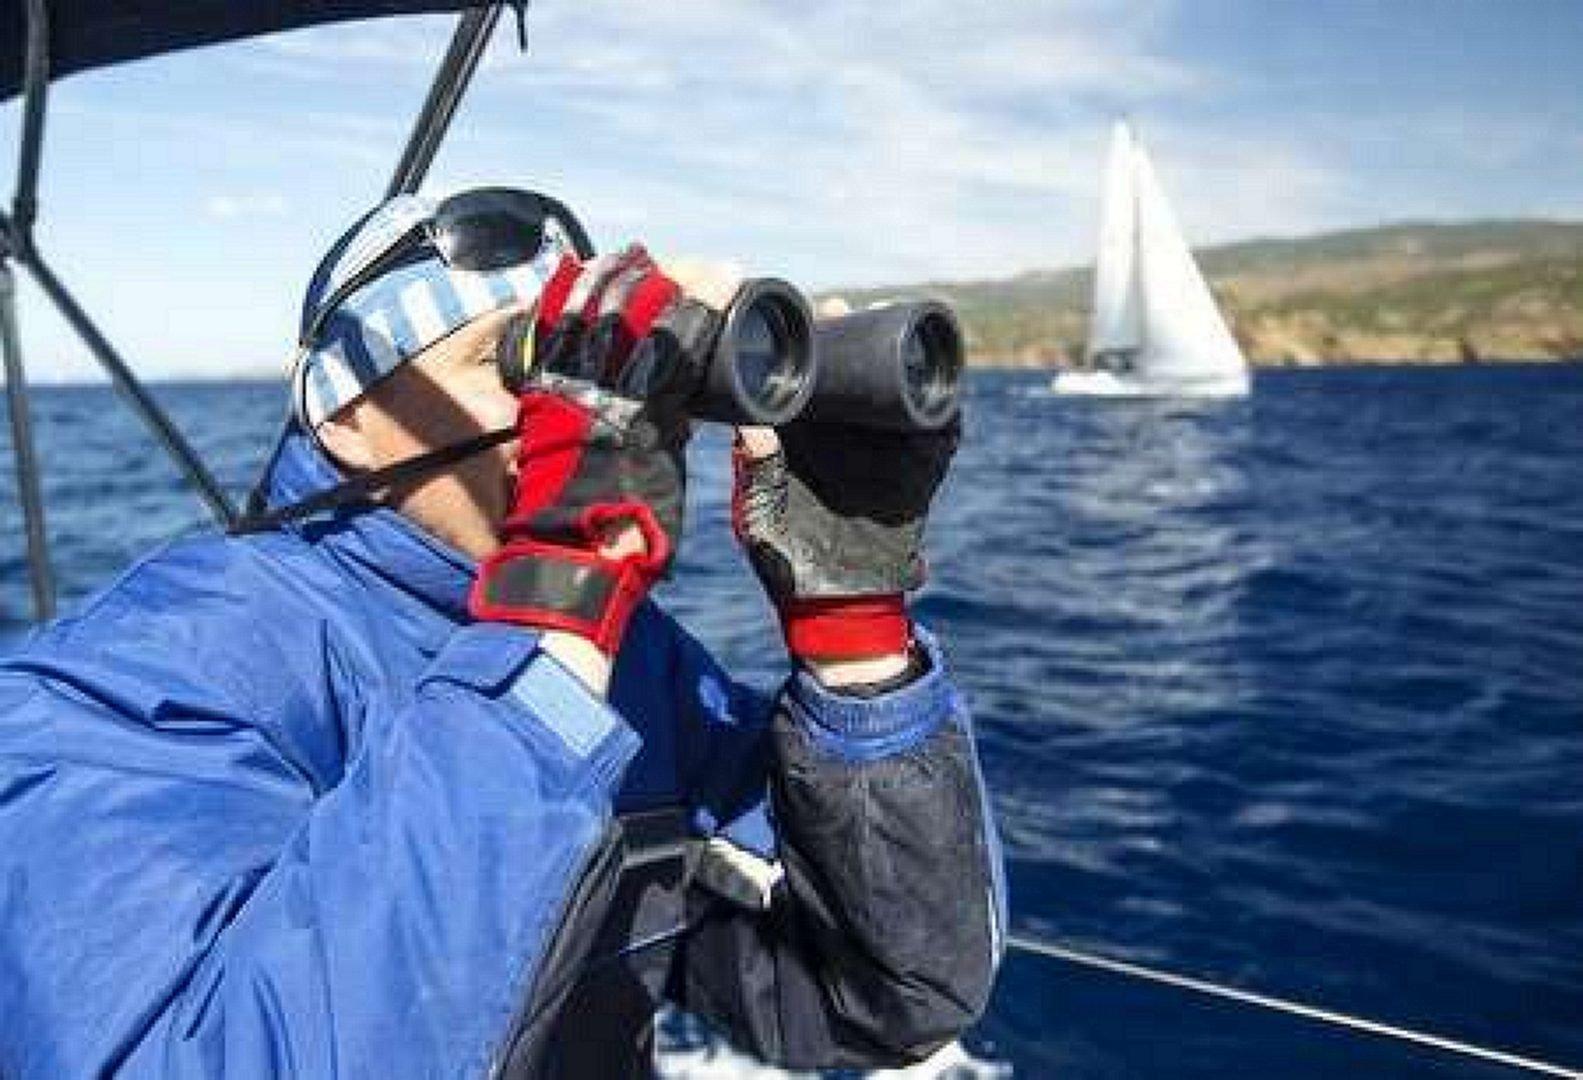 Man at the boat looks through binoculars